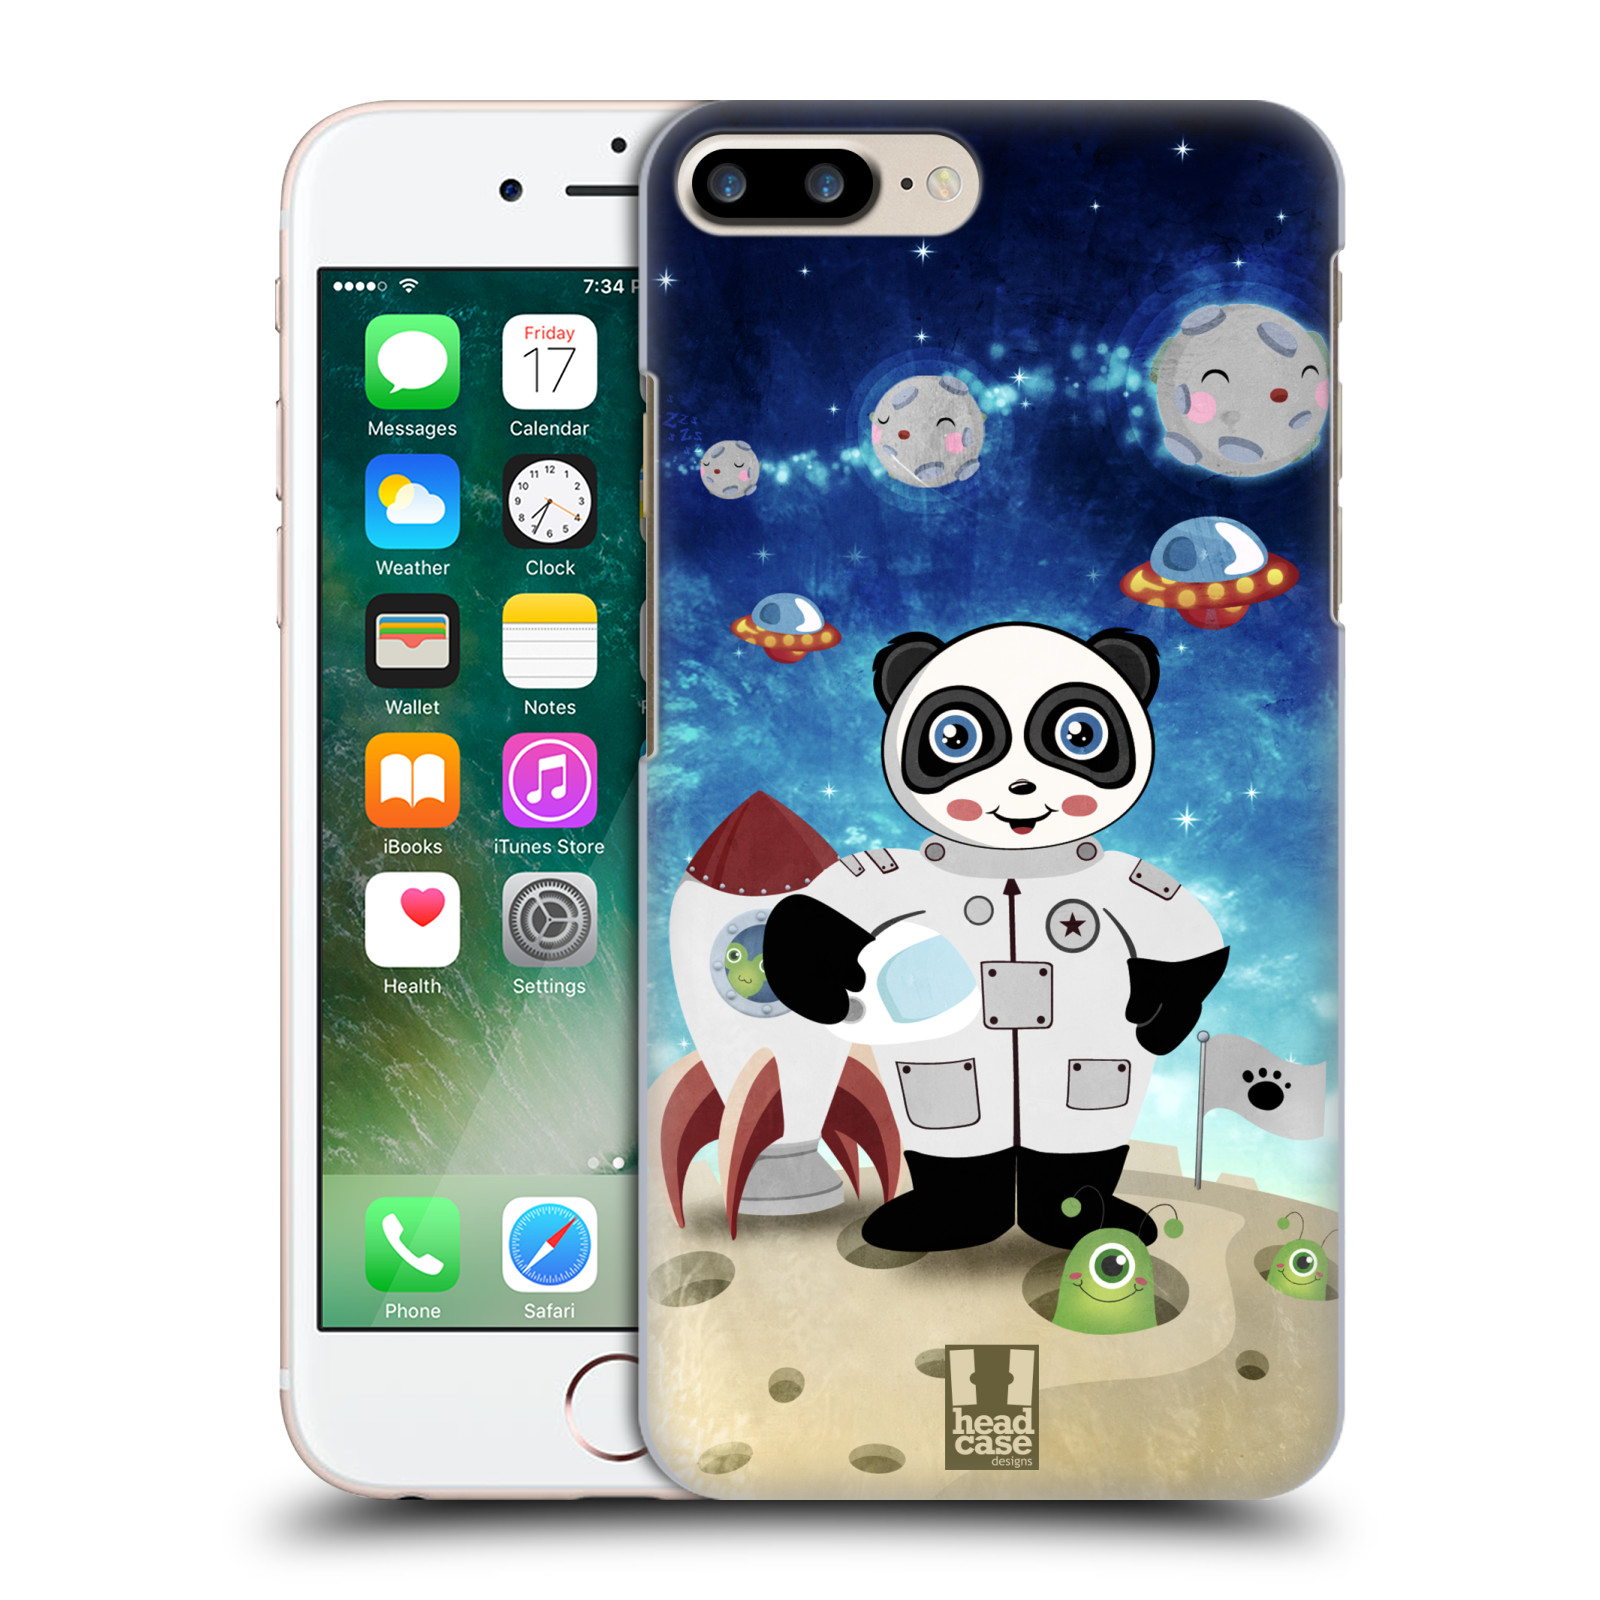 HEAD CASE plastový obal na mobil Apple Iphone 7 PLUS vzor Zvířecí astronauti vetřelec